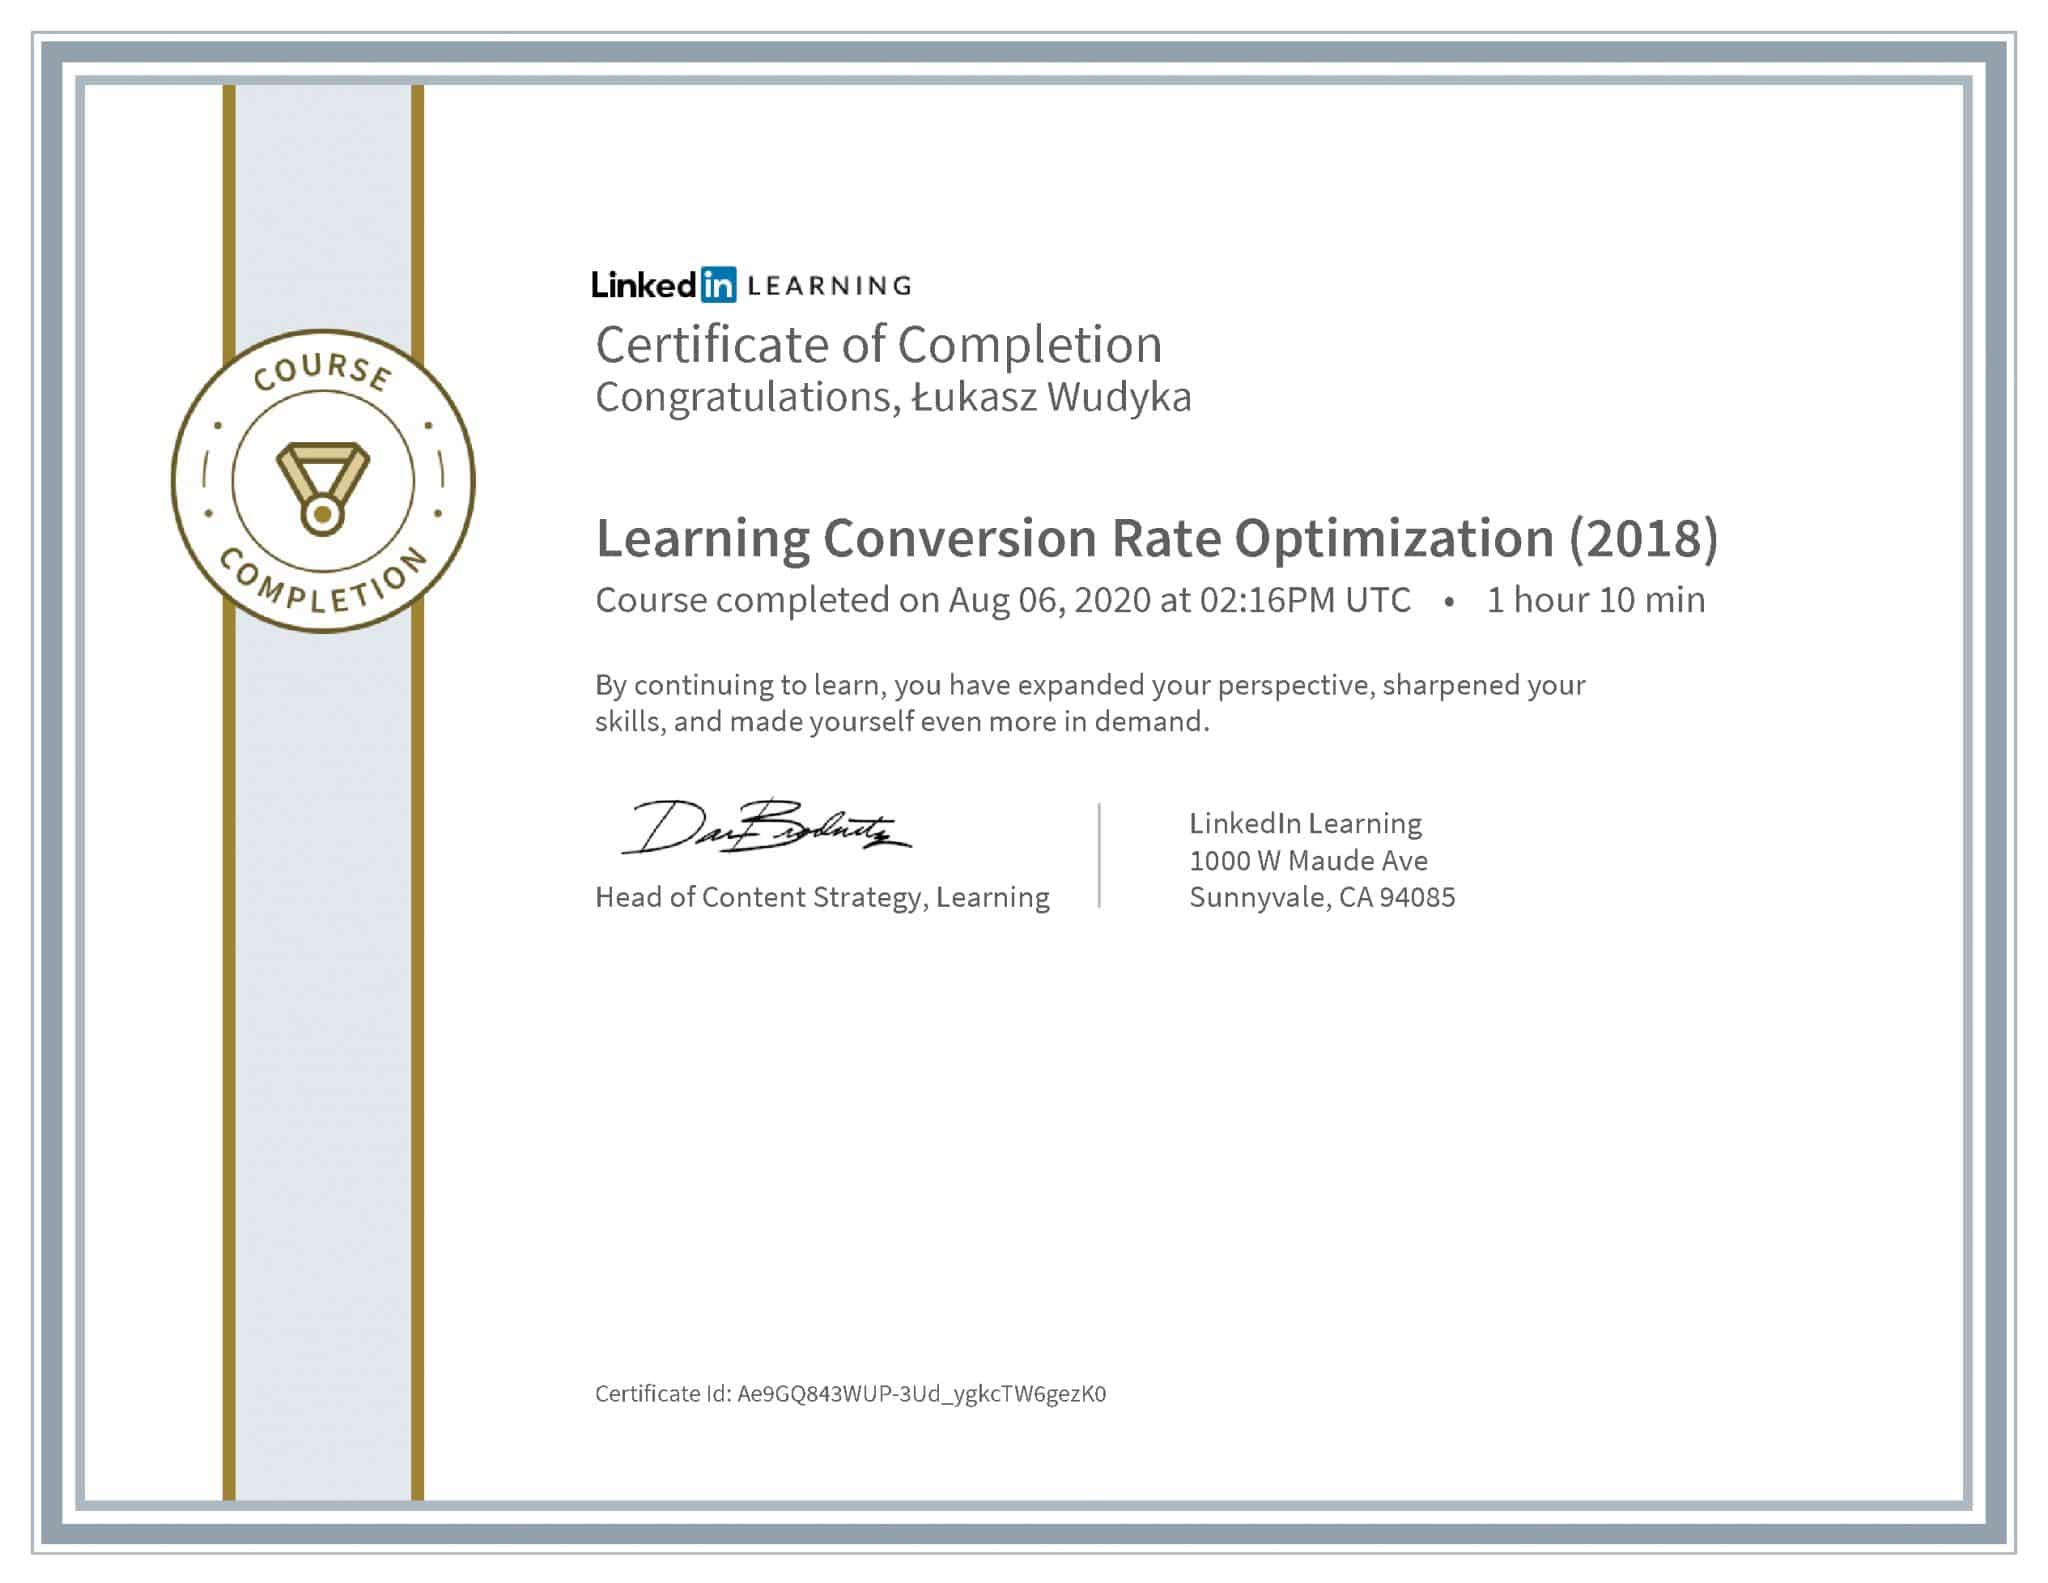 Łukasz Wudyka certyfikat LinkedIn Learning Conversion Rate Optimization (2018)